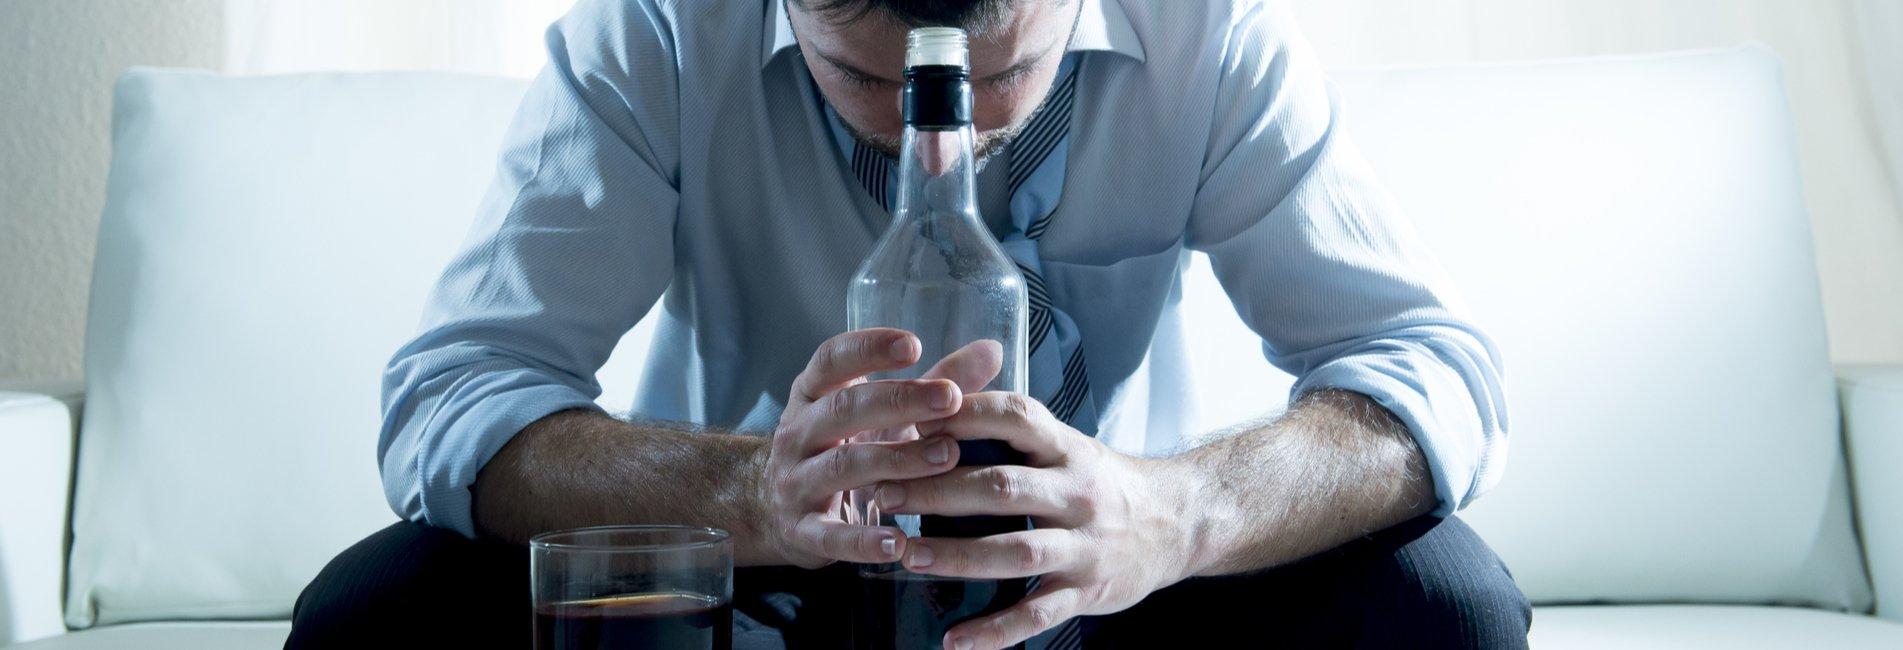 Stress and Addiction Resurgence – A man dealing with both stress and addiction holds a liquor bottle.